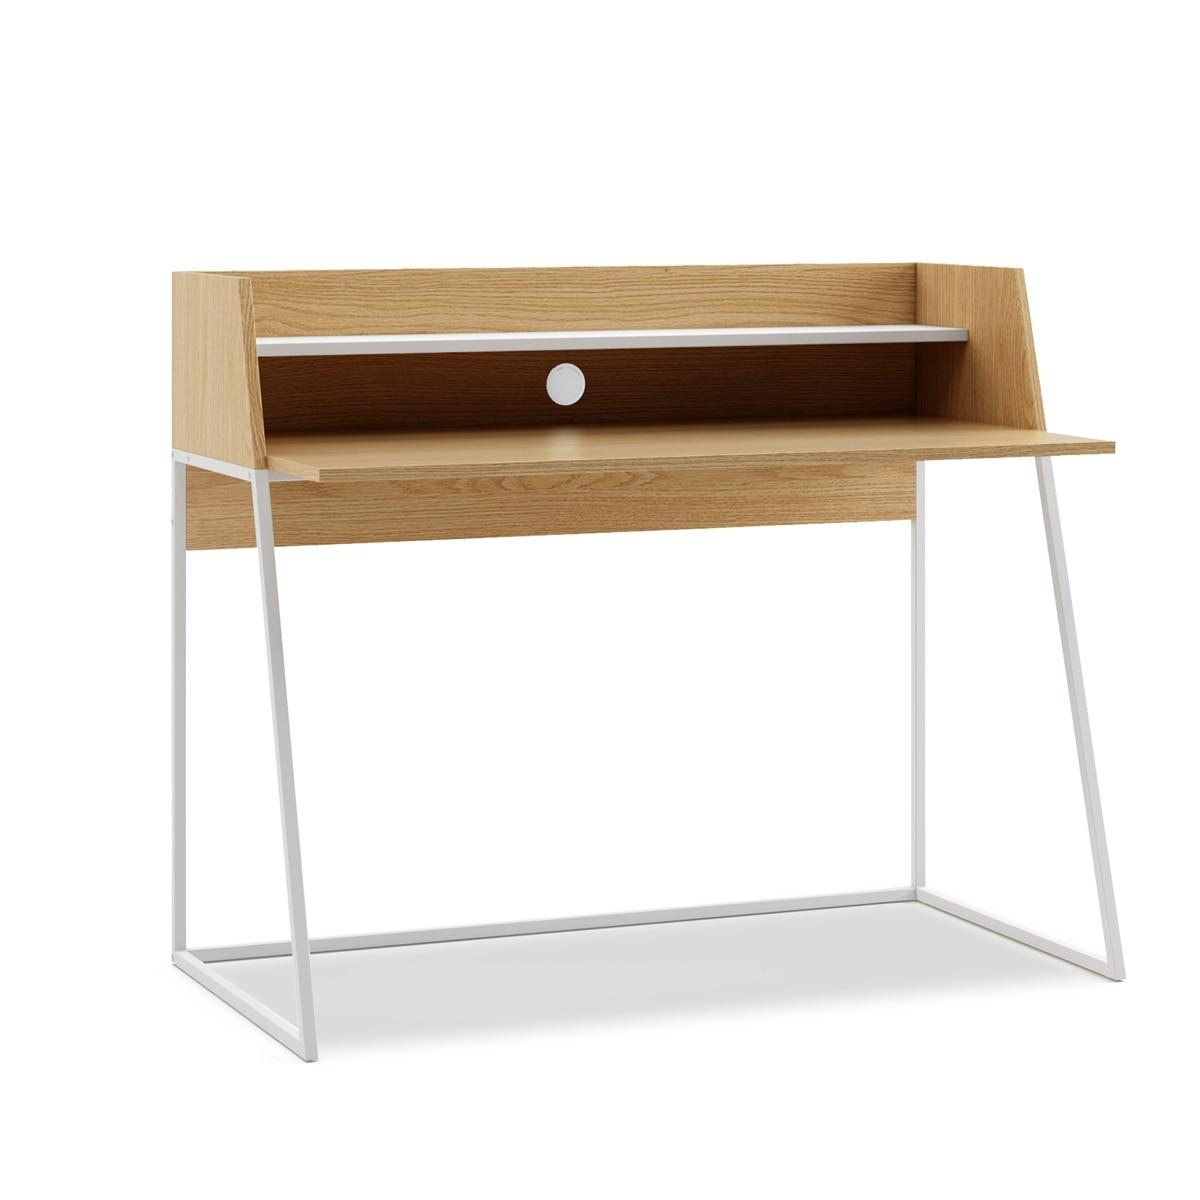 Mc Haus-Desktop Office Dispatch Kala Wood And White 120x62x89cm